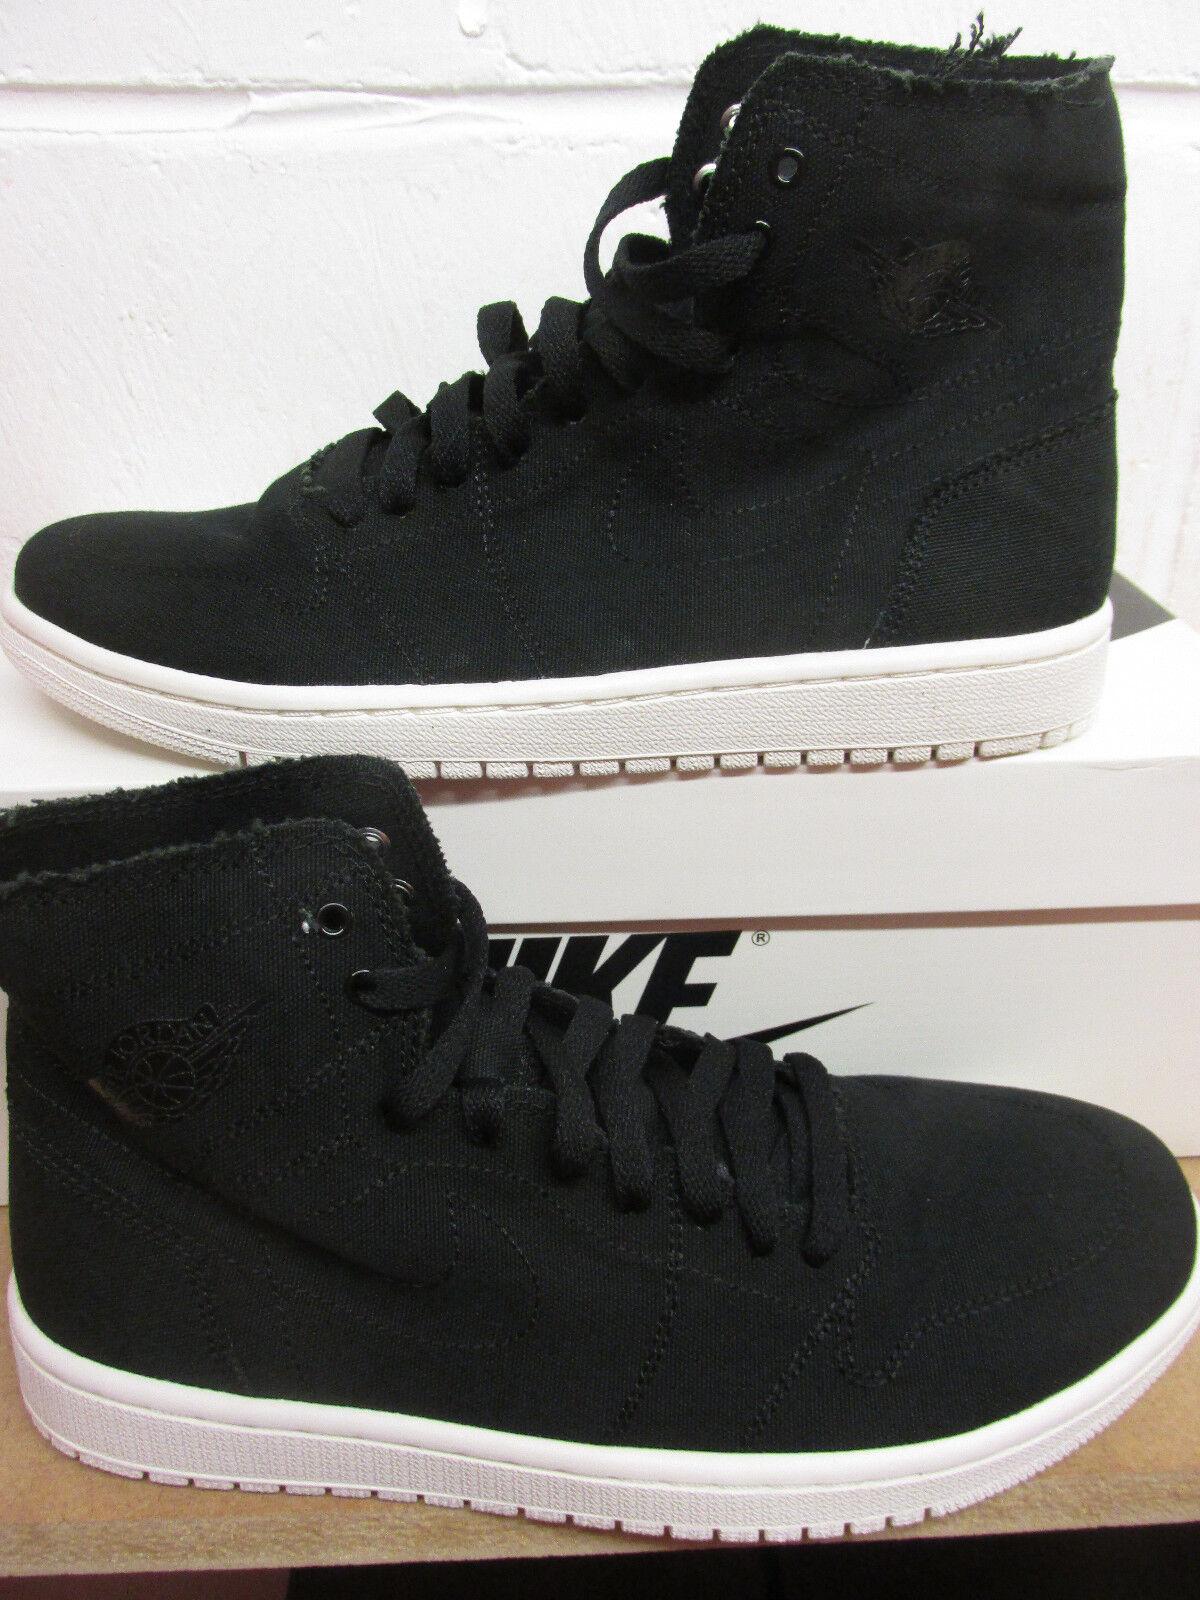 Nike Air Jordan 1 Retro High Decon Basketball Trainers 867338 010 Sneakers Shoe